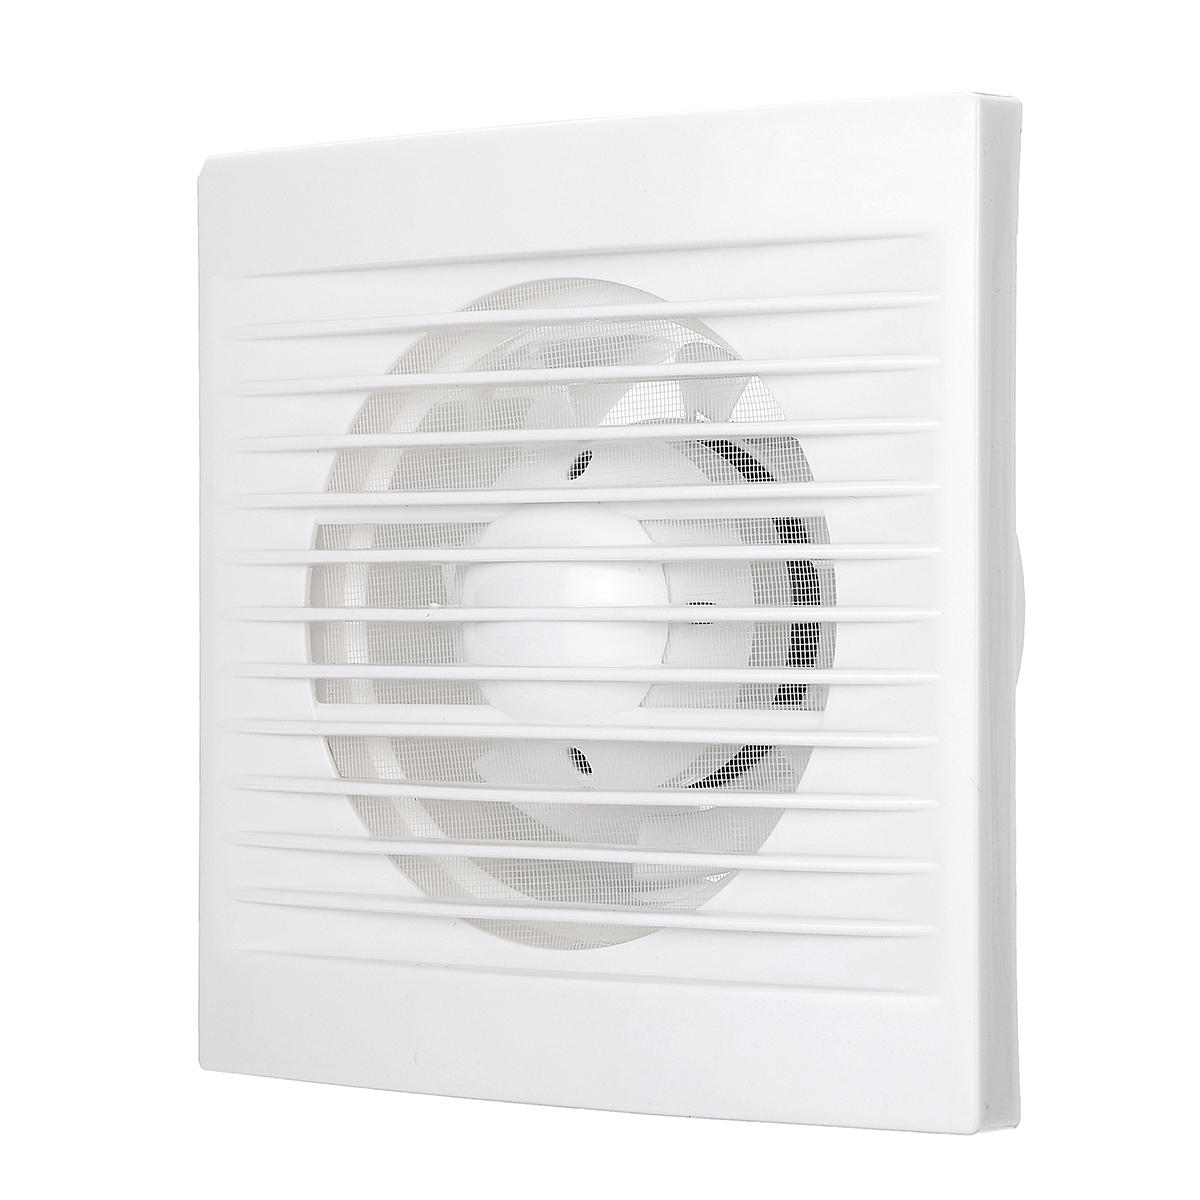 4inch 6inch Ventilating Exhaust Extractor Fan For Bathroom Toilet